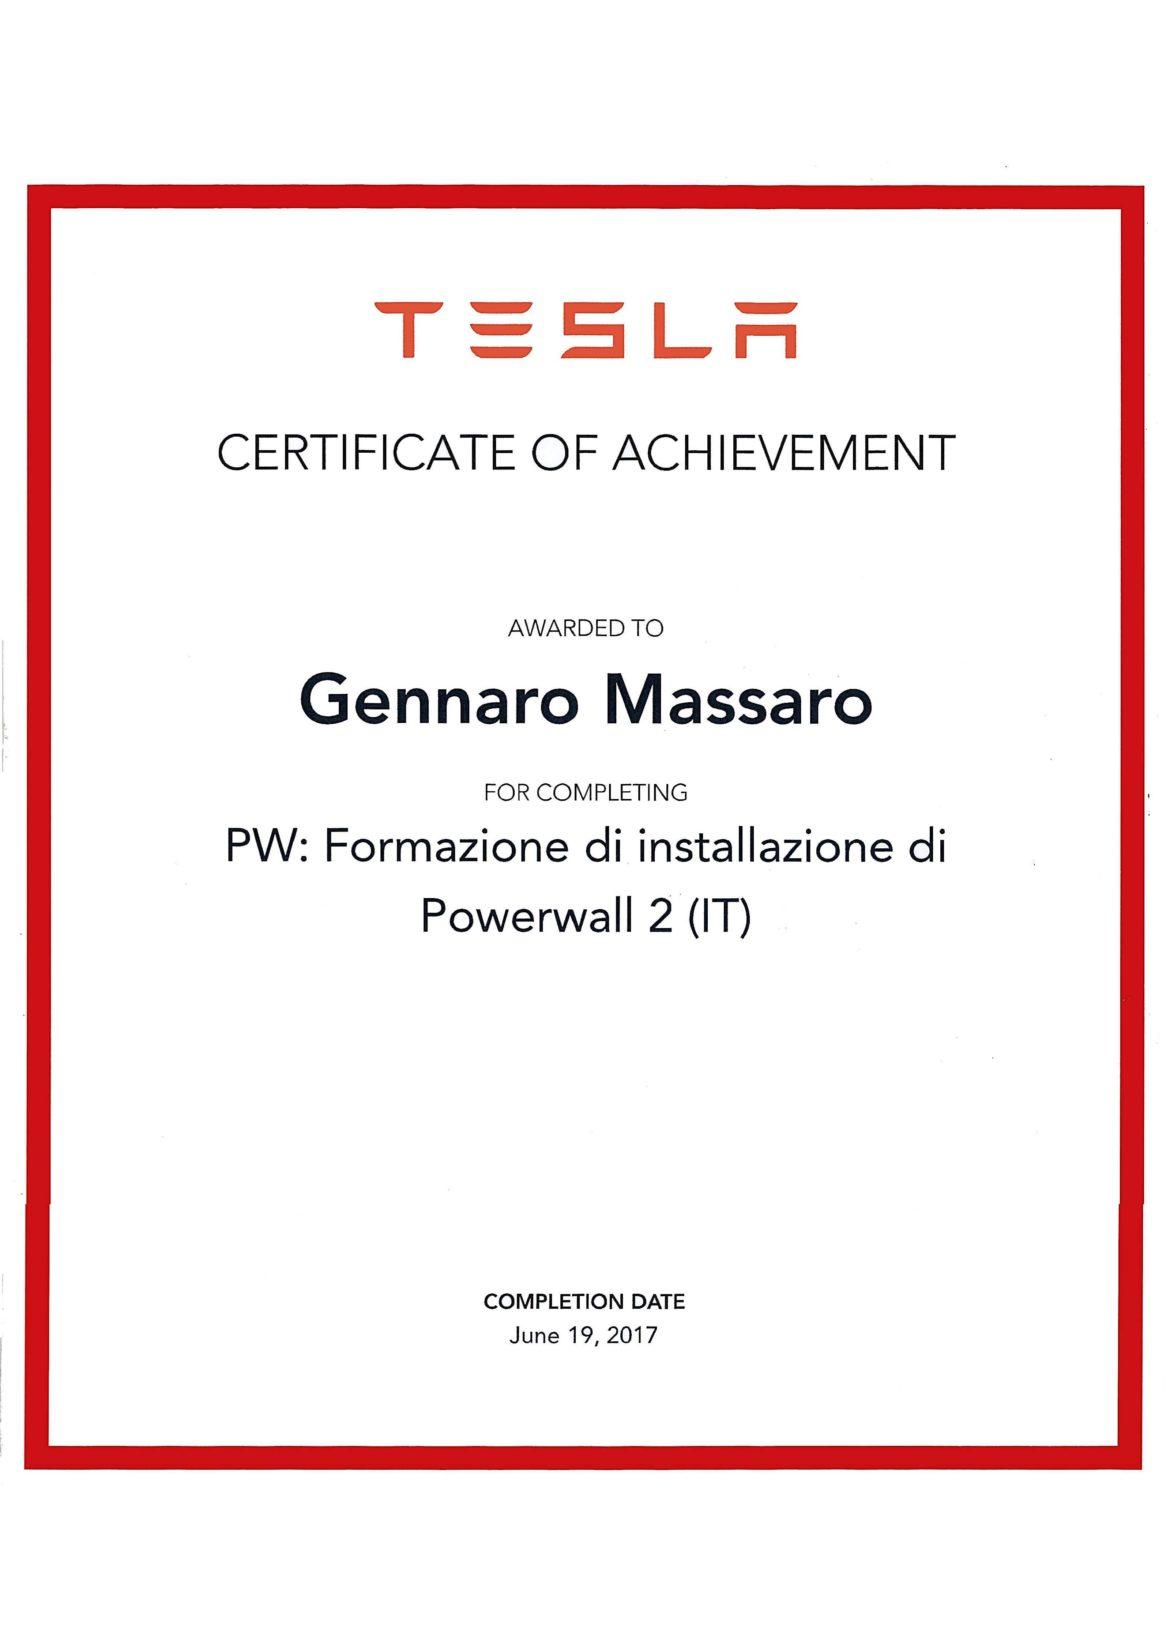 Tesla-Attestato-Formazione-Powerwall-II.jpg